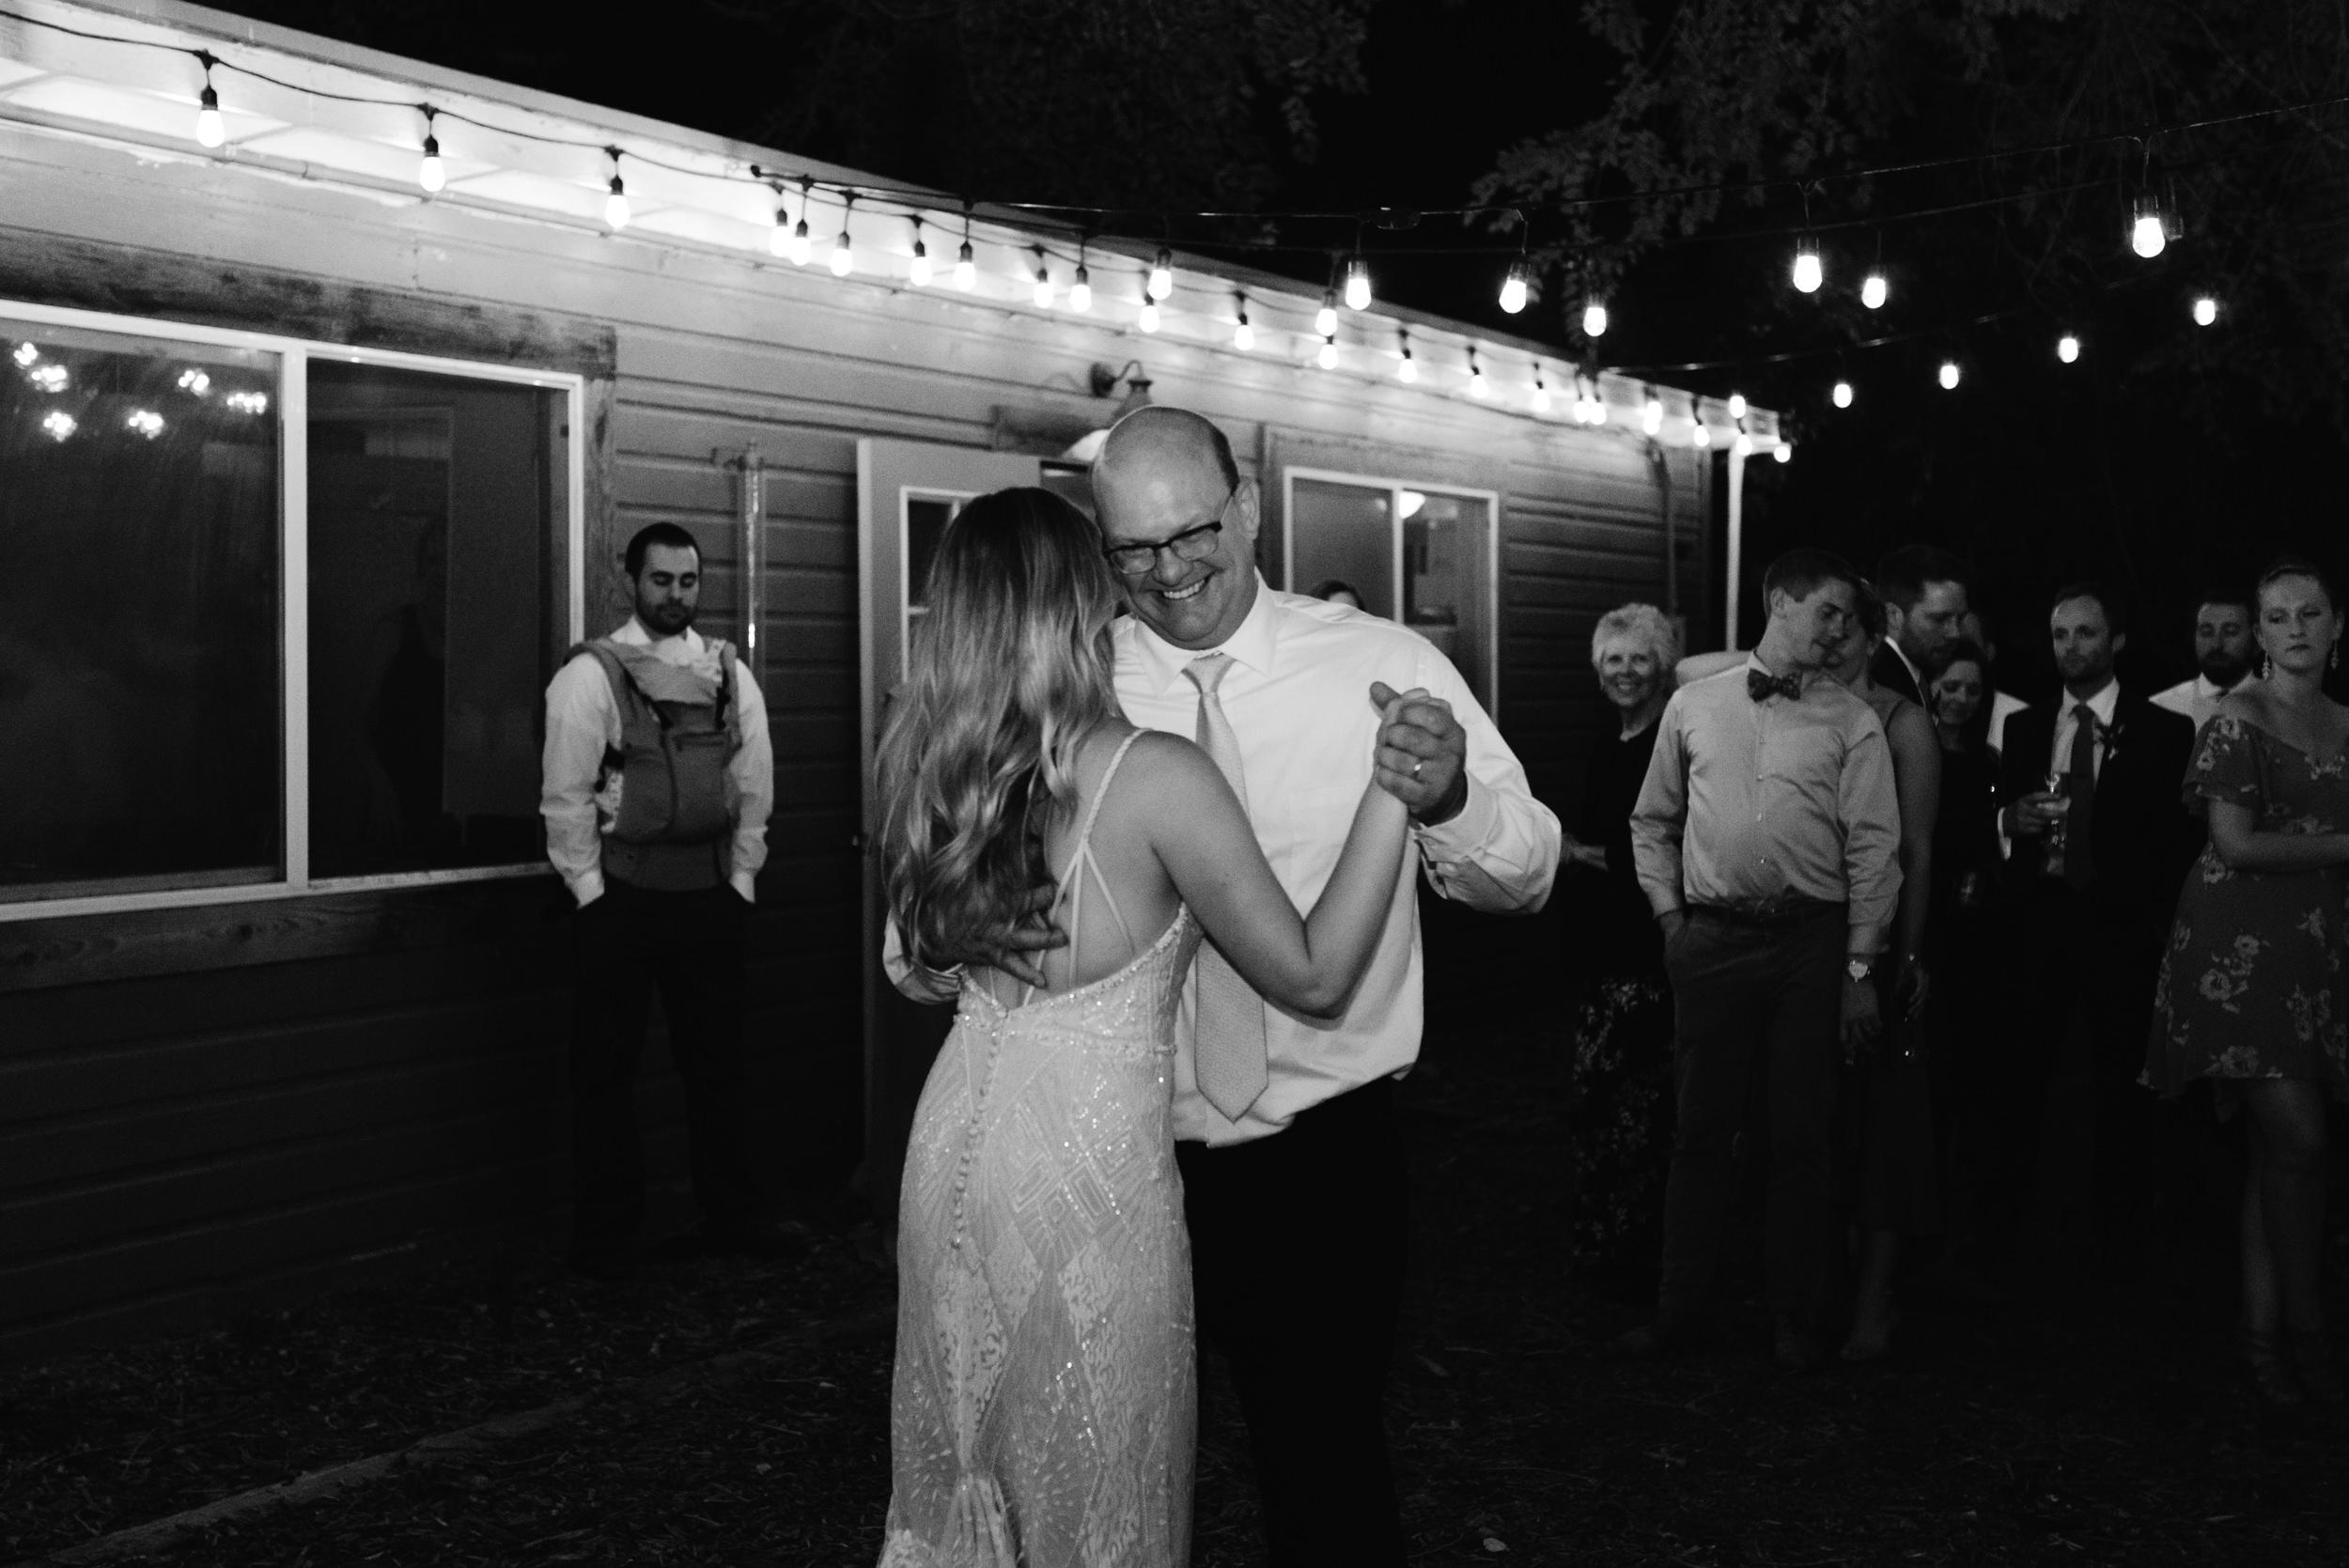 Colorado boho wedding and elopement photographer. Breckenridge, Vail, and Aspen elopement and wedding photographer for adventurous couples.